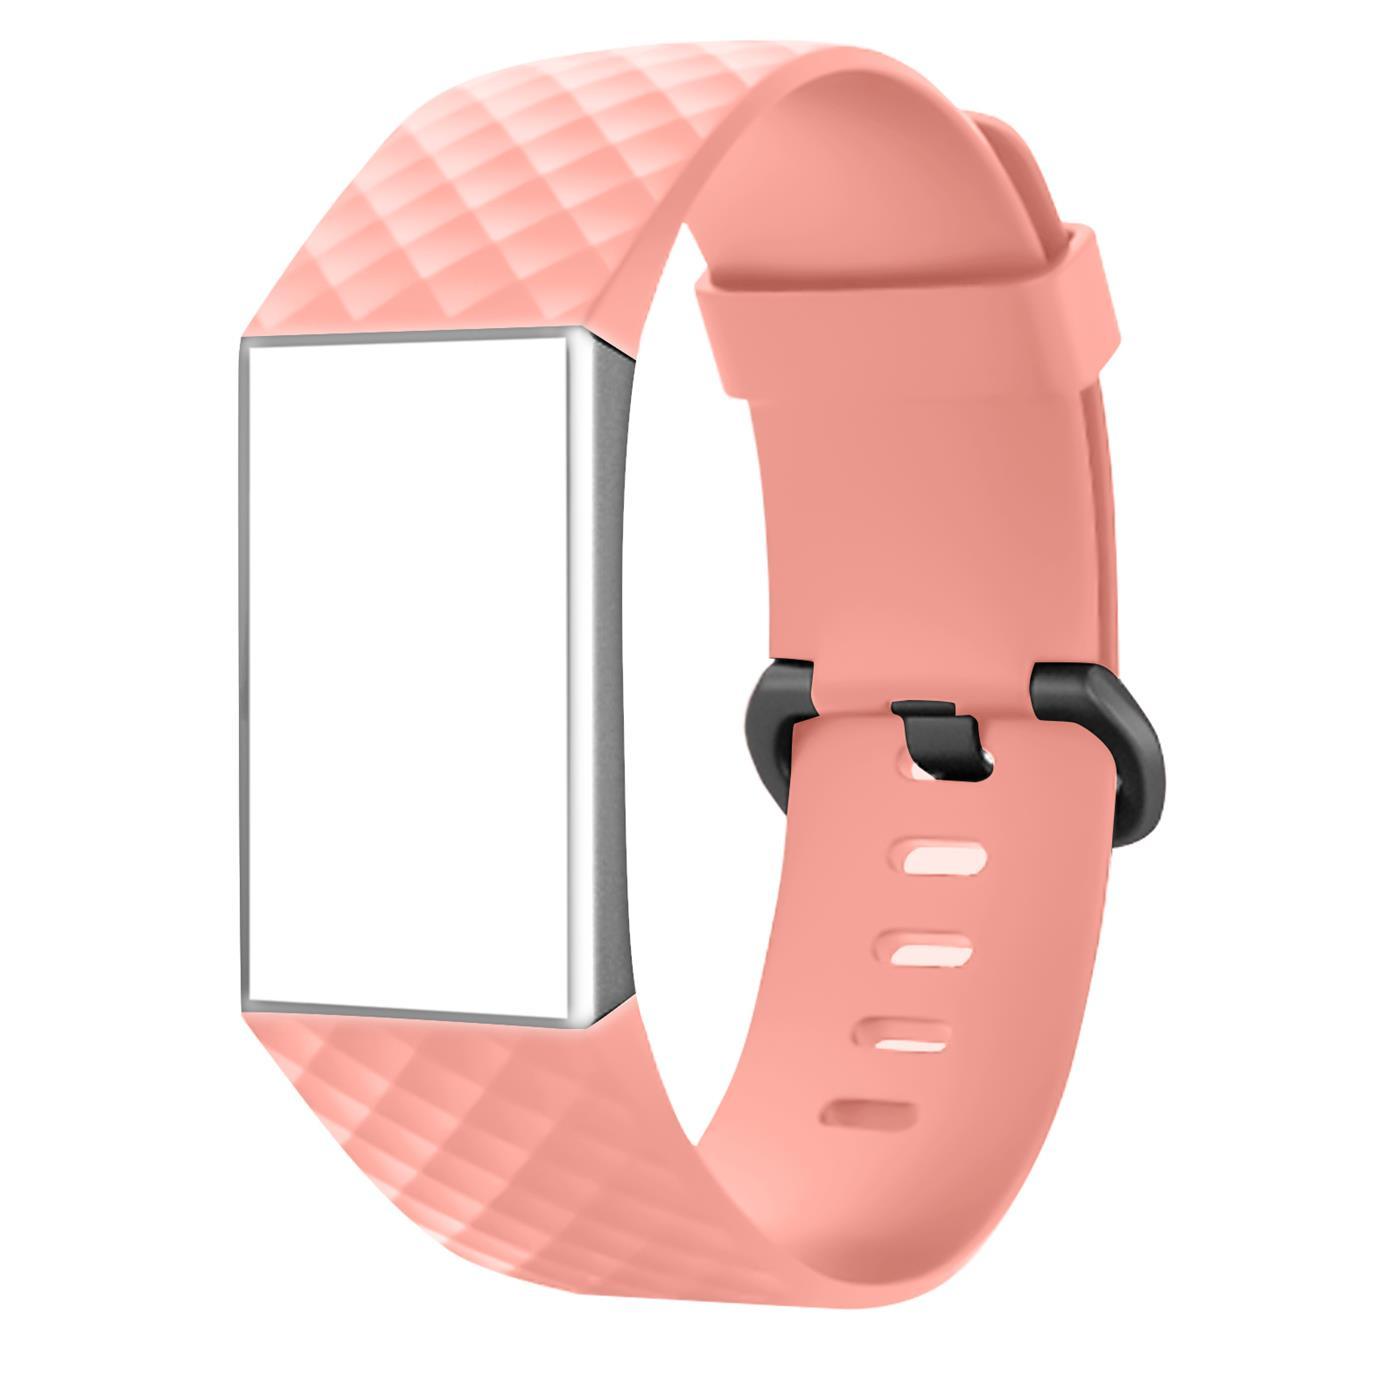 Fitbit-Groesse-S-oder-L-Ersatz-Silikon-Armband-Uhren-Sport-Band-Fitness-Tracker Indexbild 22